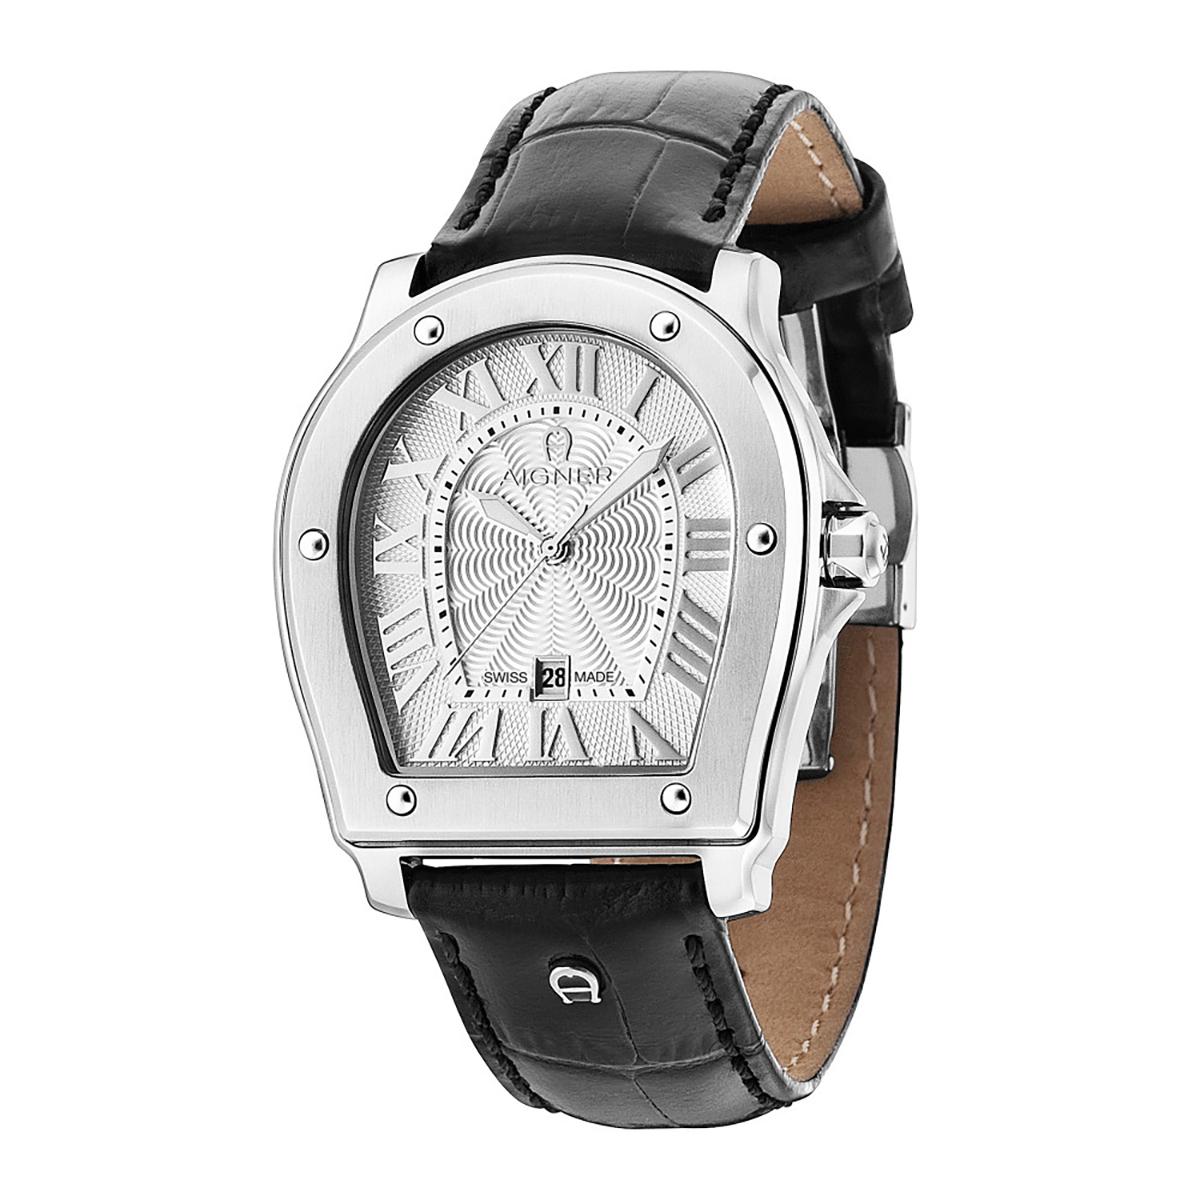 ساعت مچی عقربه ای مردانه اگنر مدل A105105